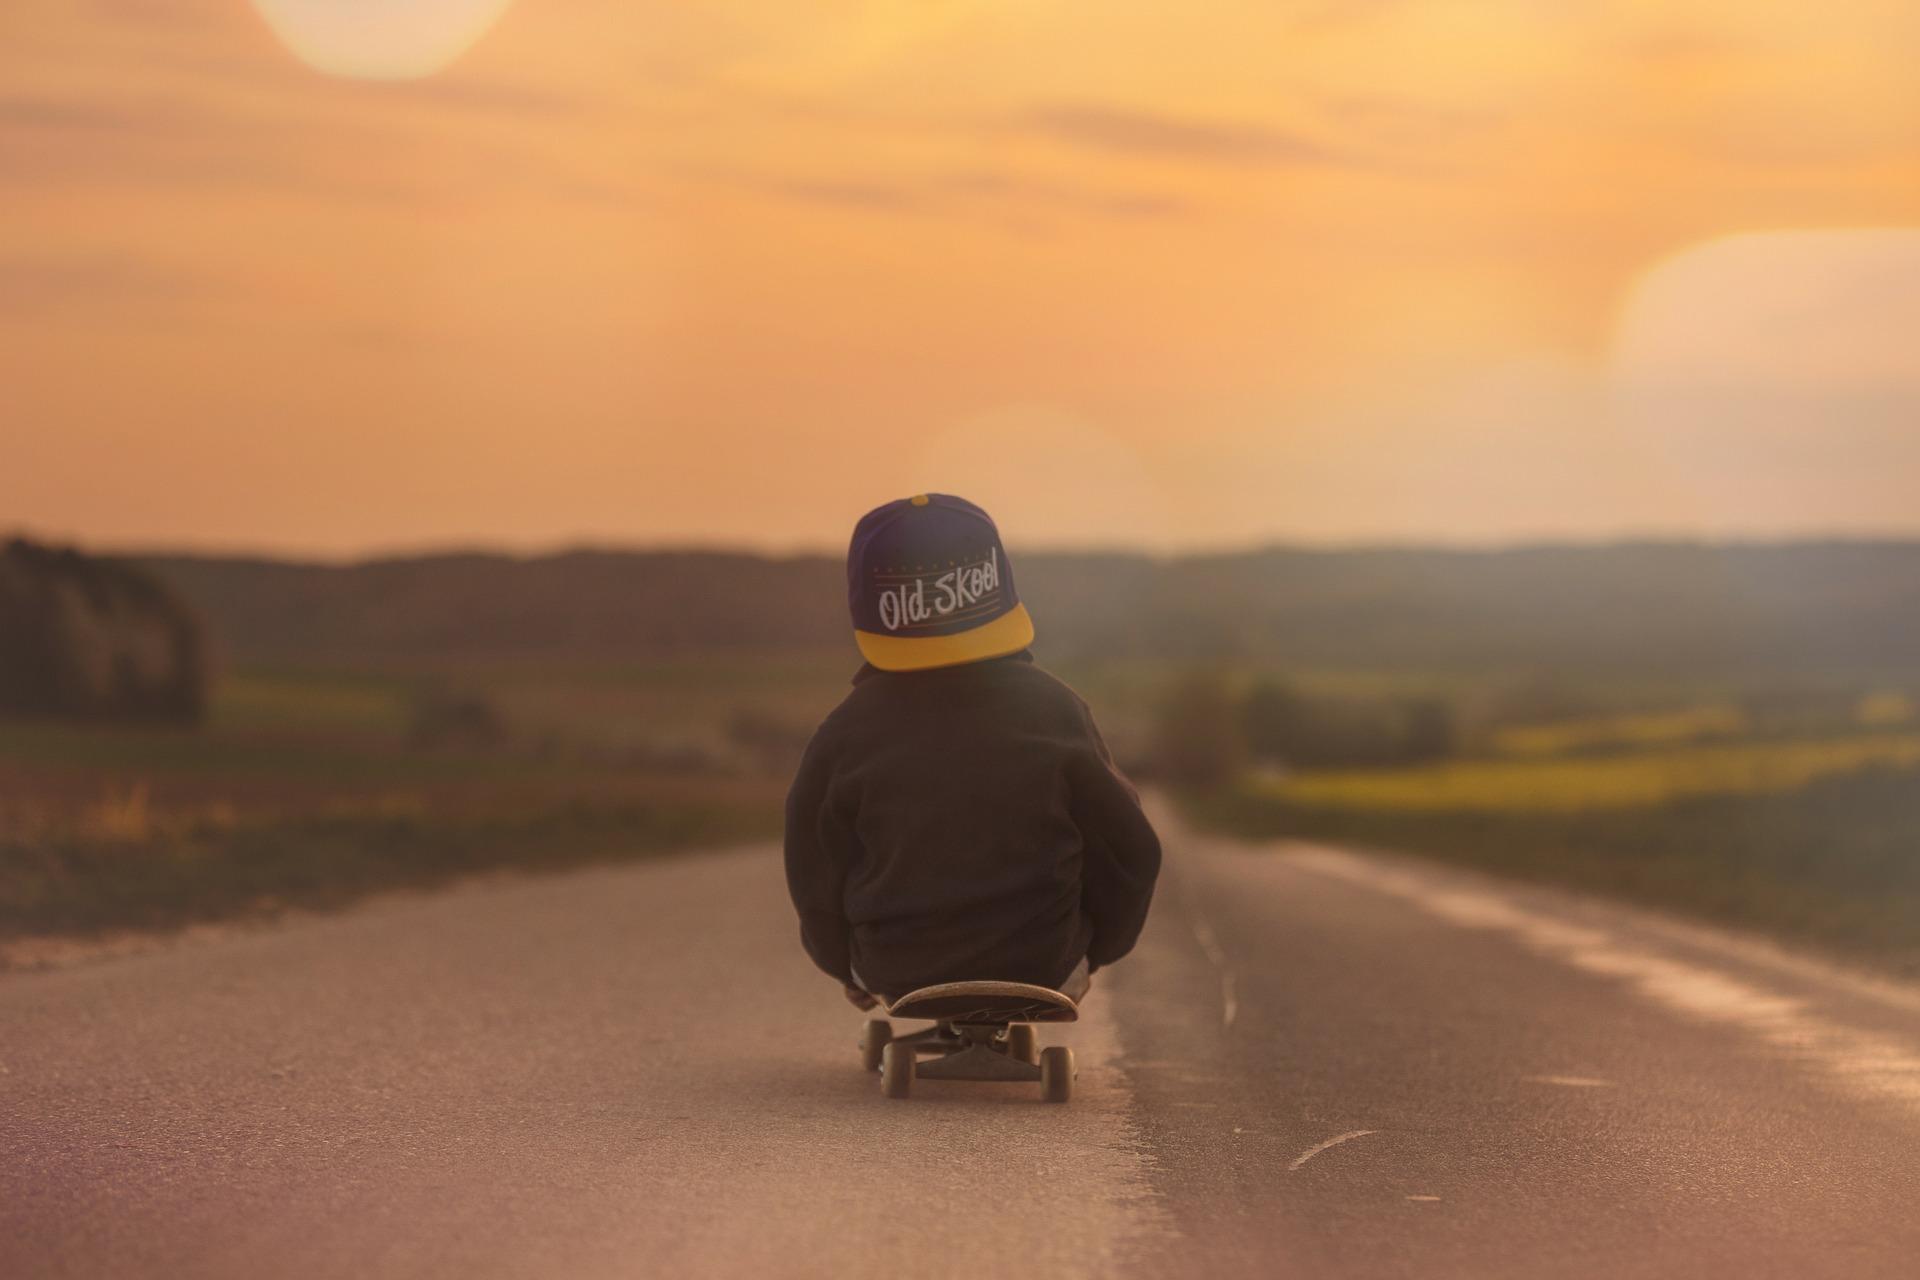 skateboard-331751_1920.jpg